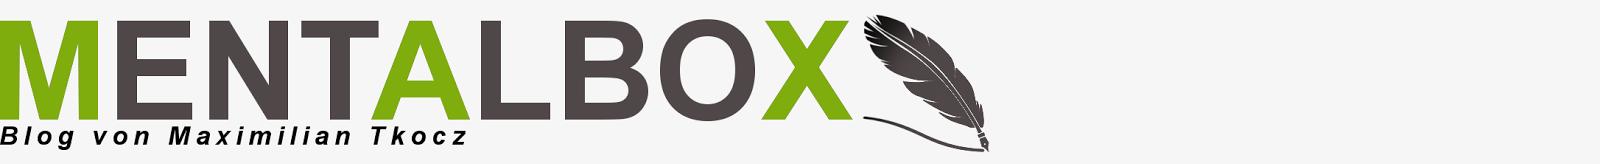 MENTALBOX – Blog – Maximilian Tkocz